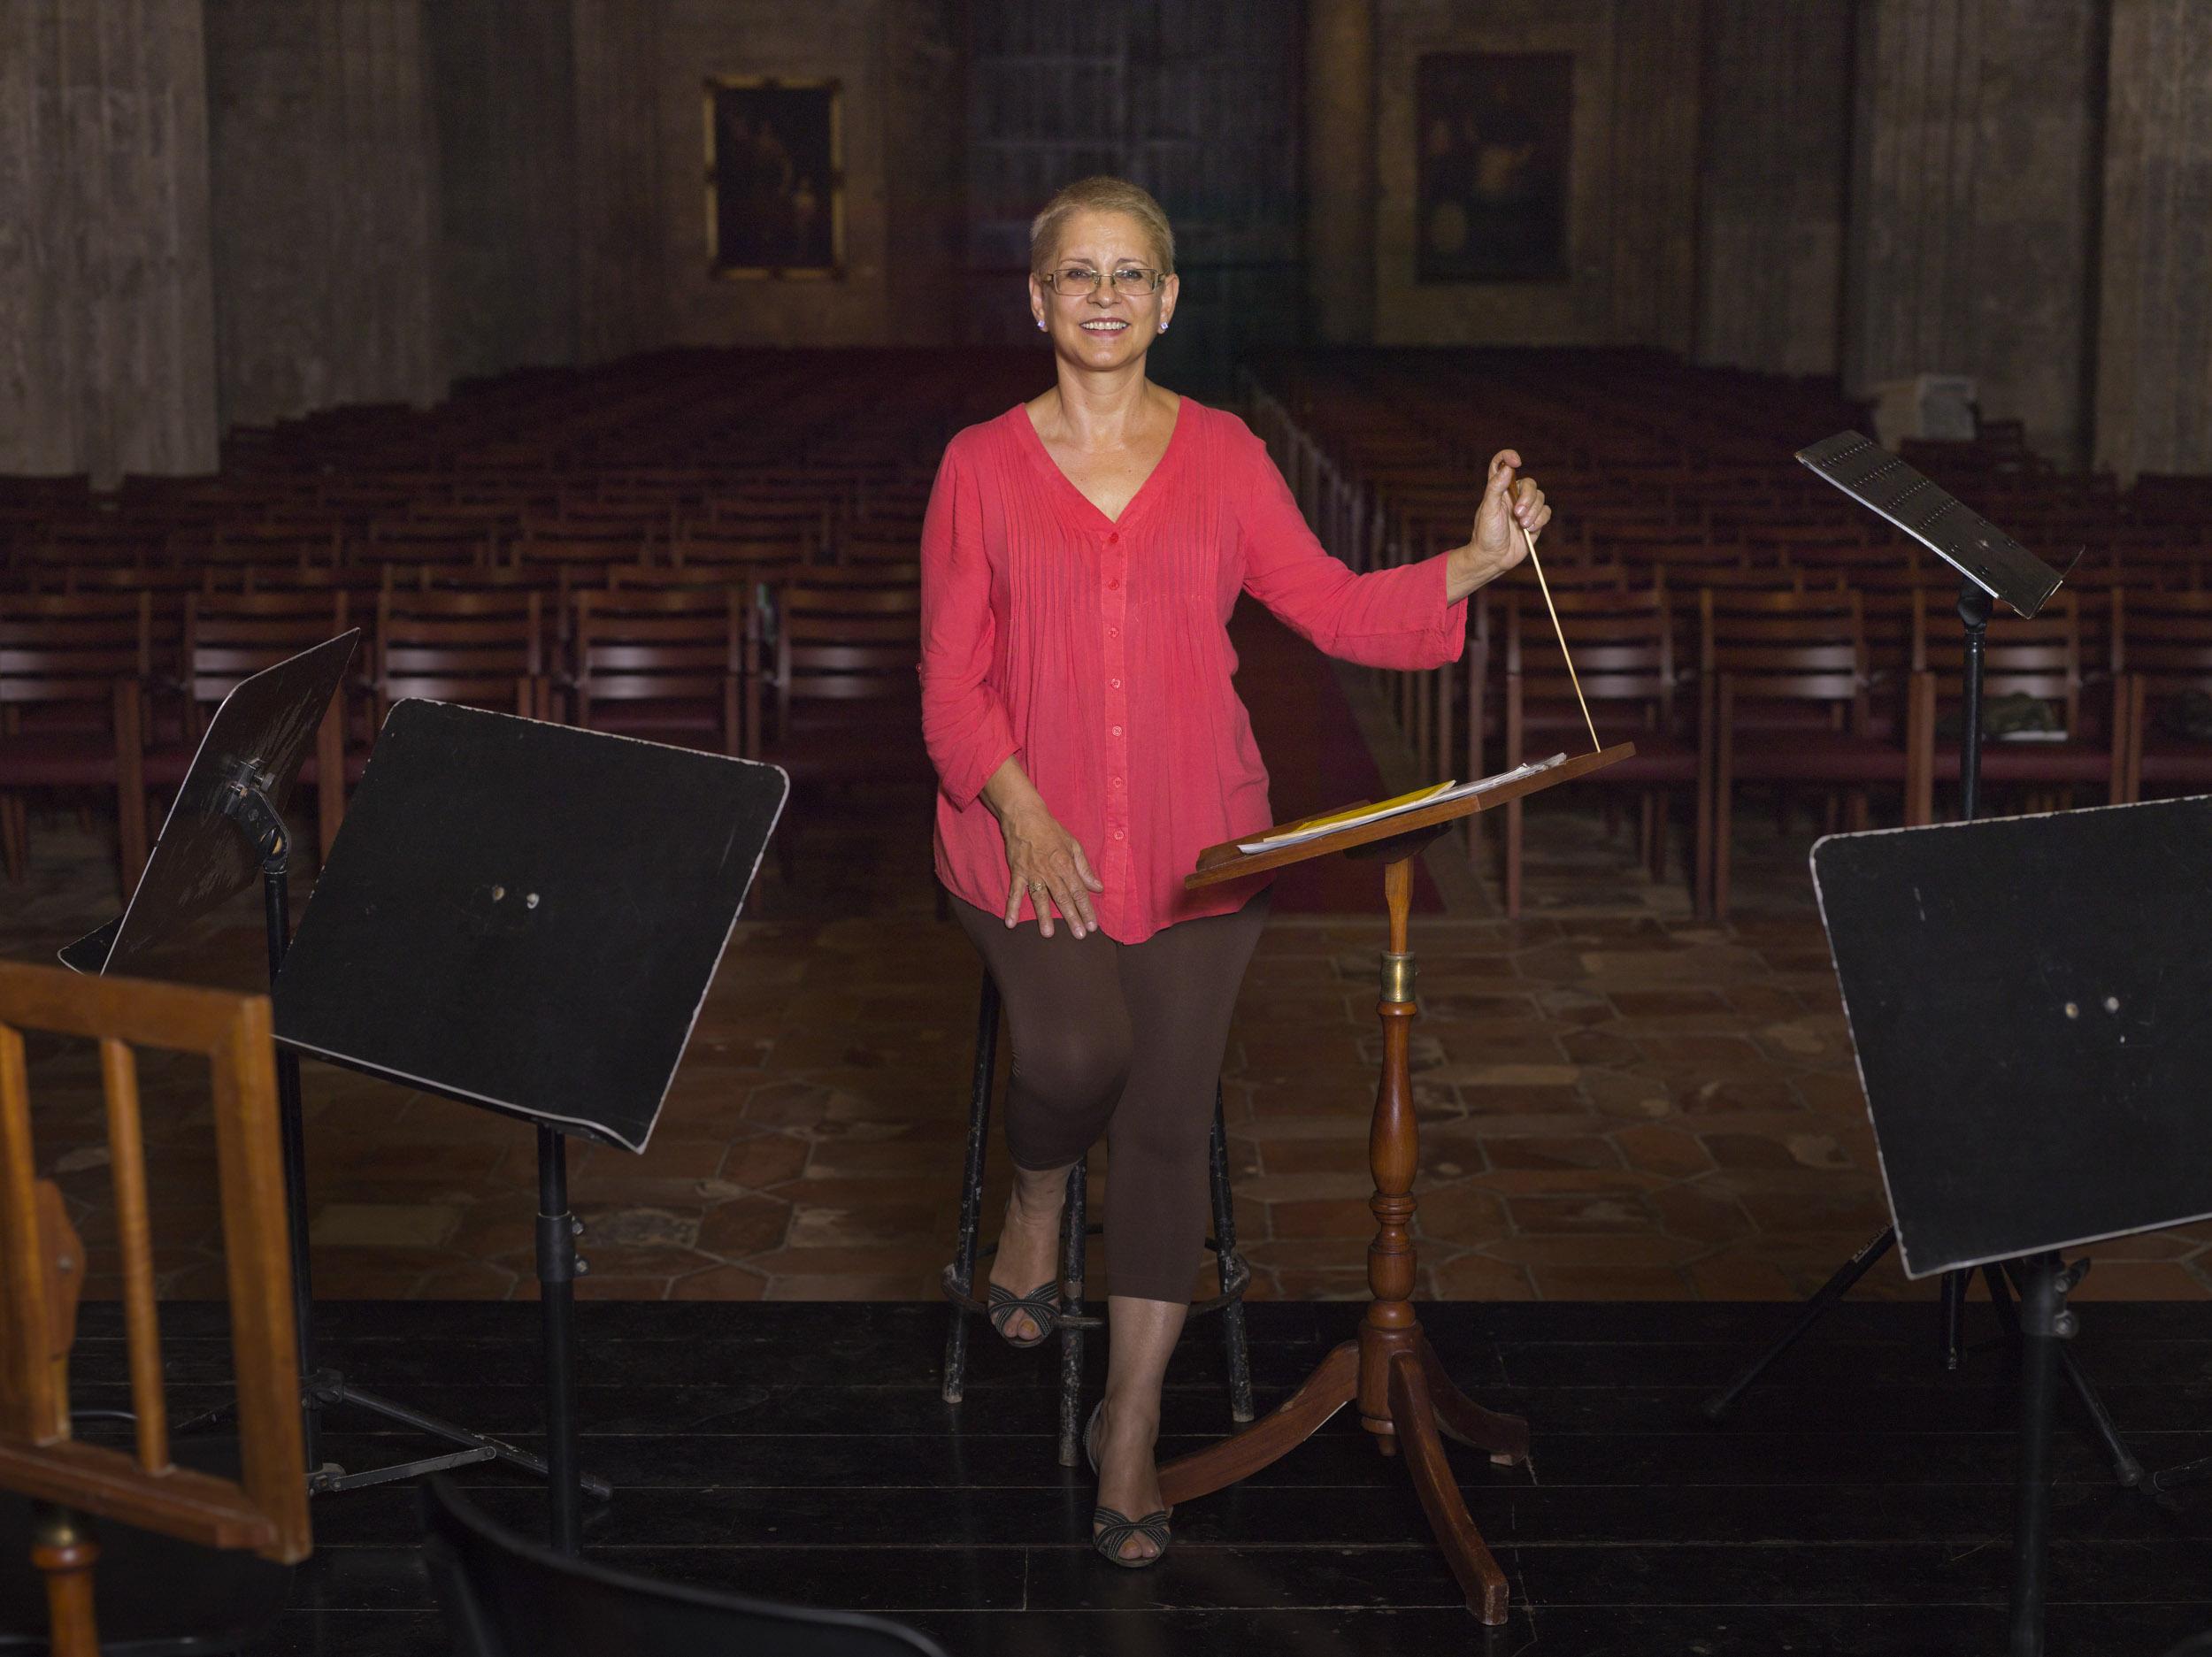 Zenaida Romeu, musician - Illuminated Cuba - Hector Garrido, Aerial and human photography